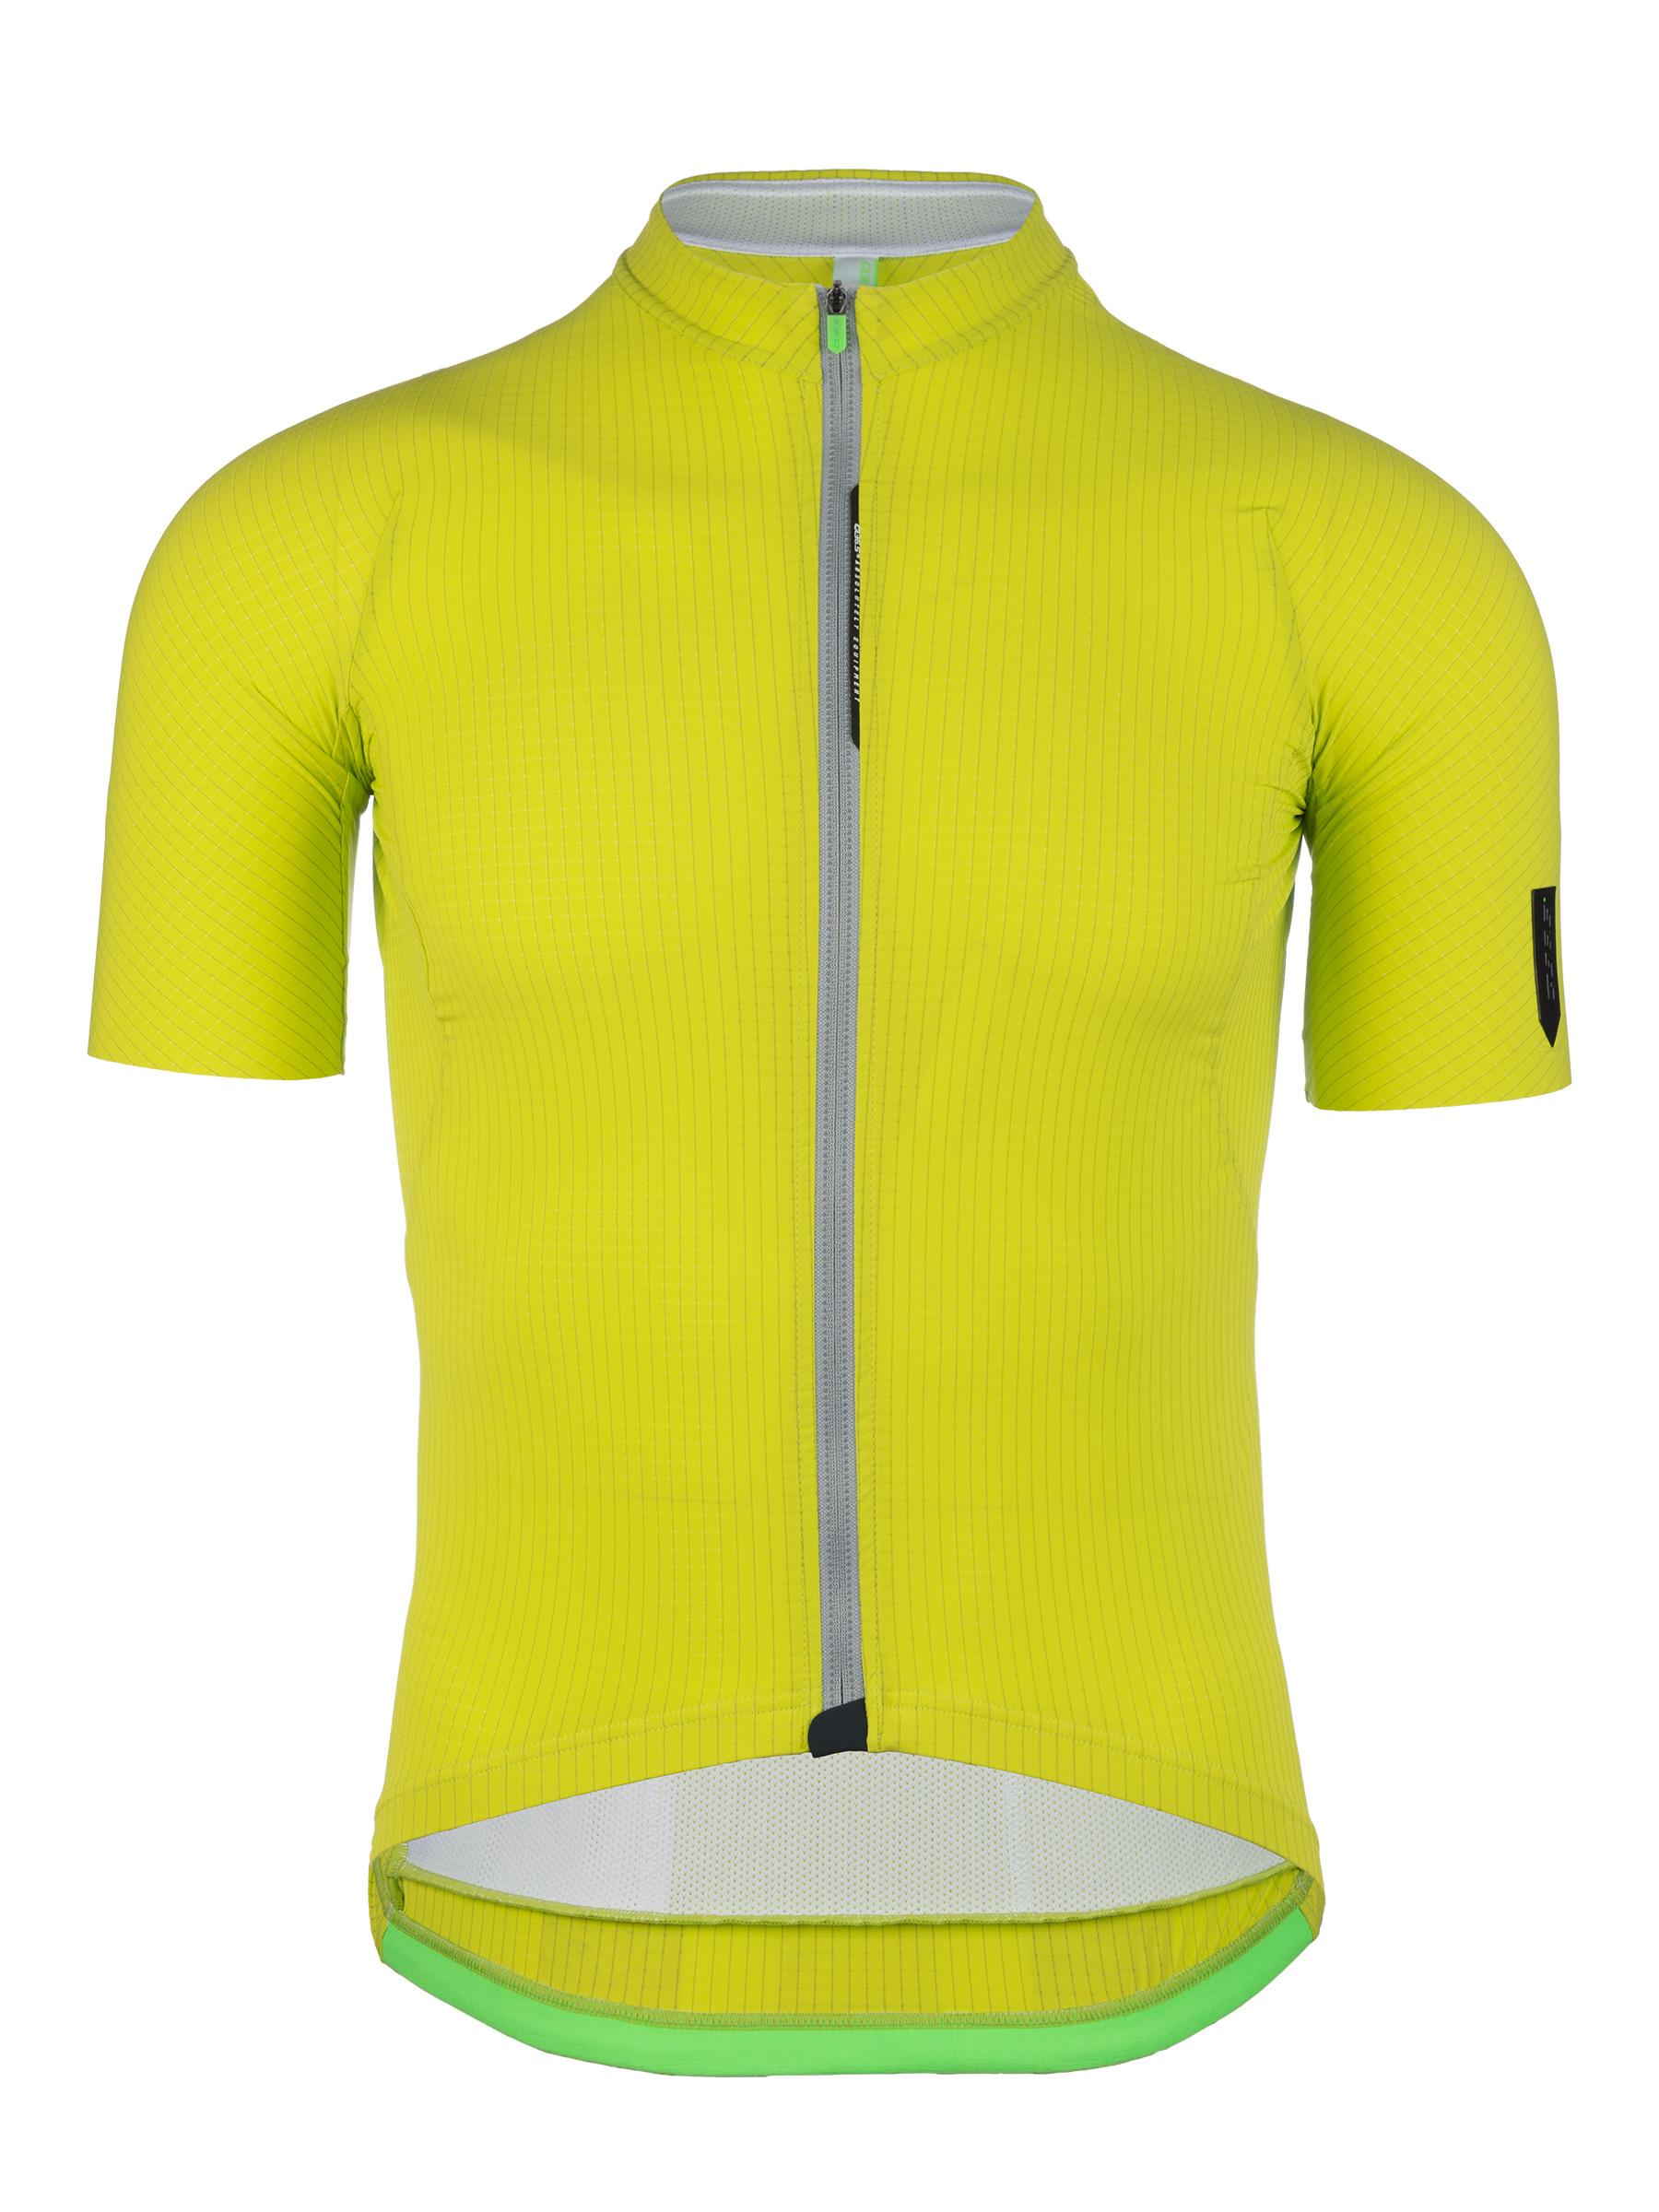 mens cycling jersey Pinstripe